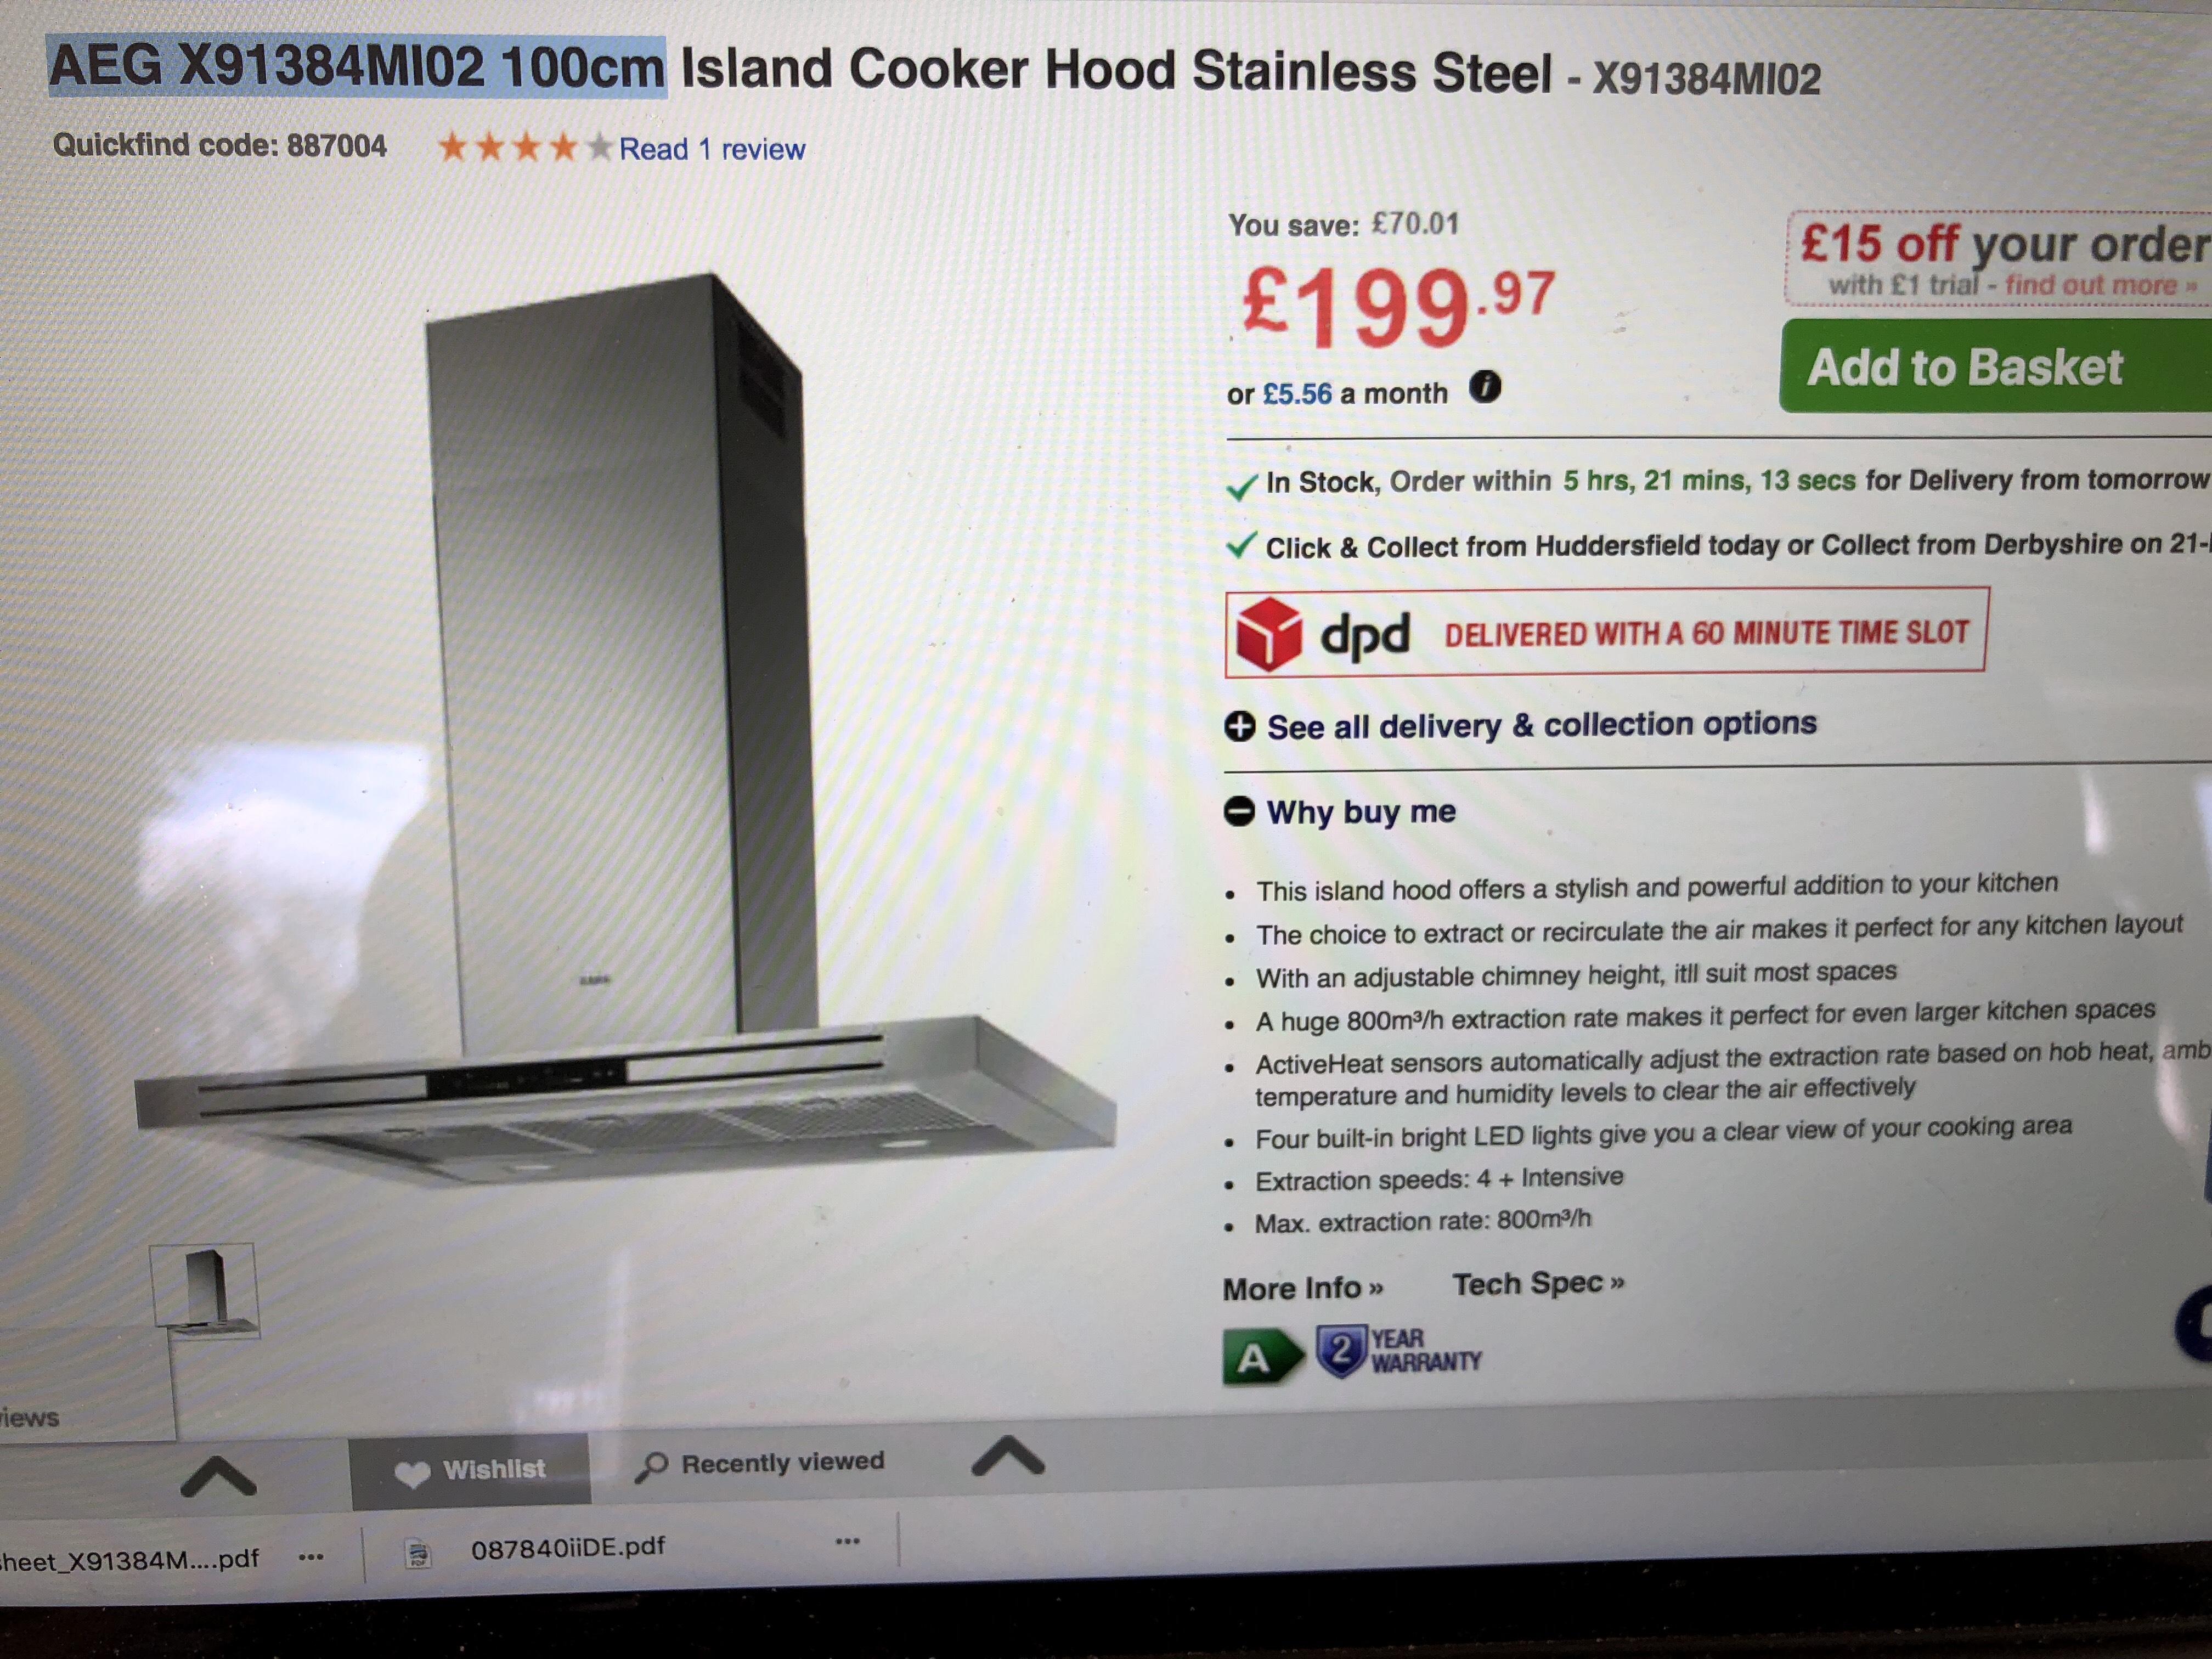 AEG X91384Mi02 100cm hood - £199.97 at Appliances Direct